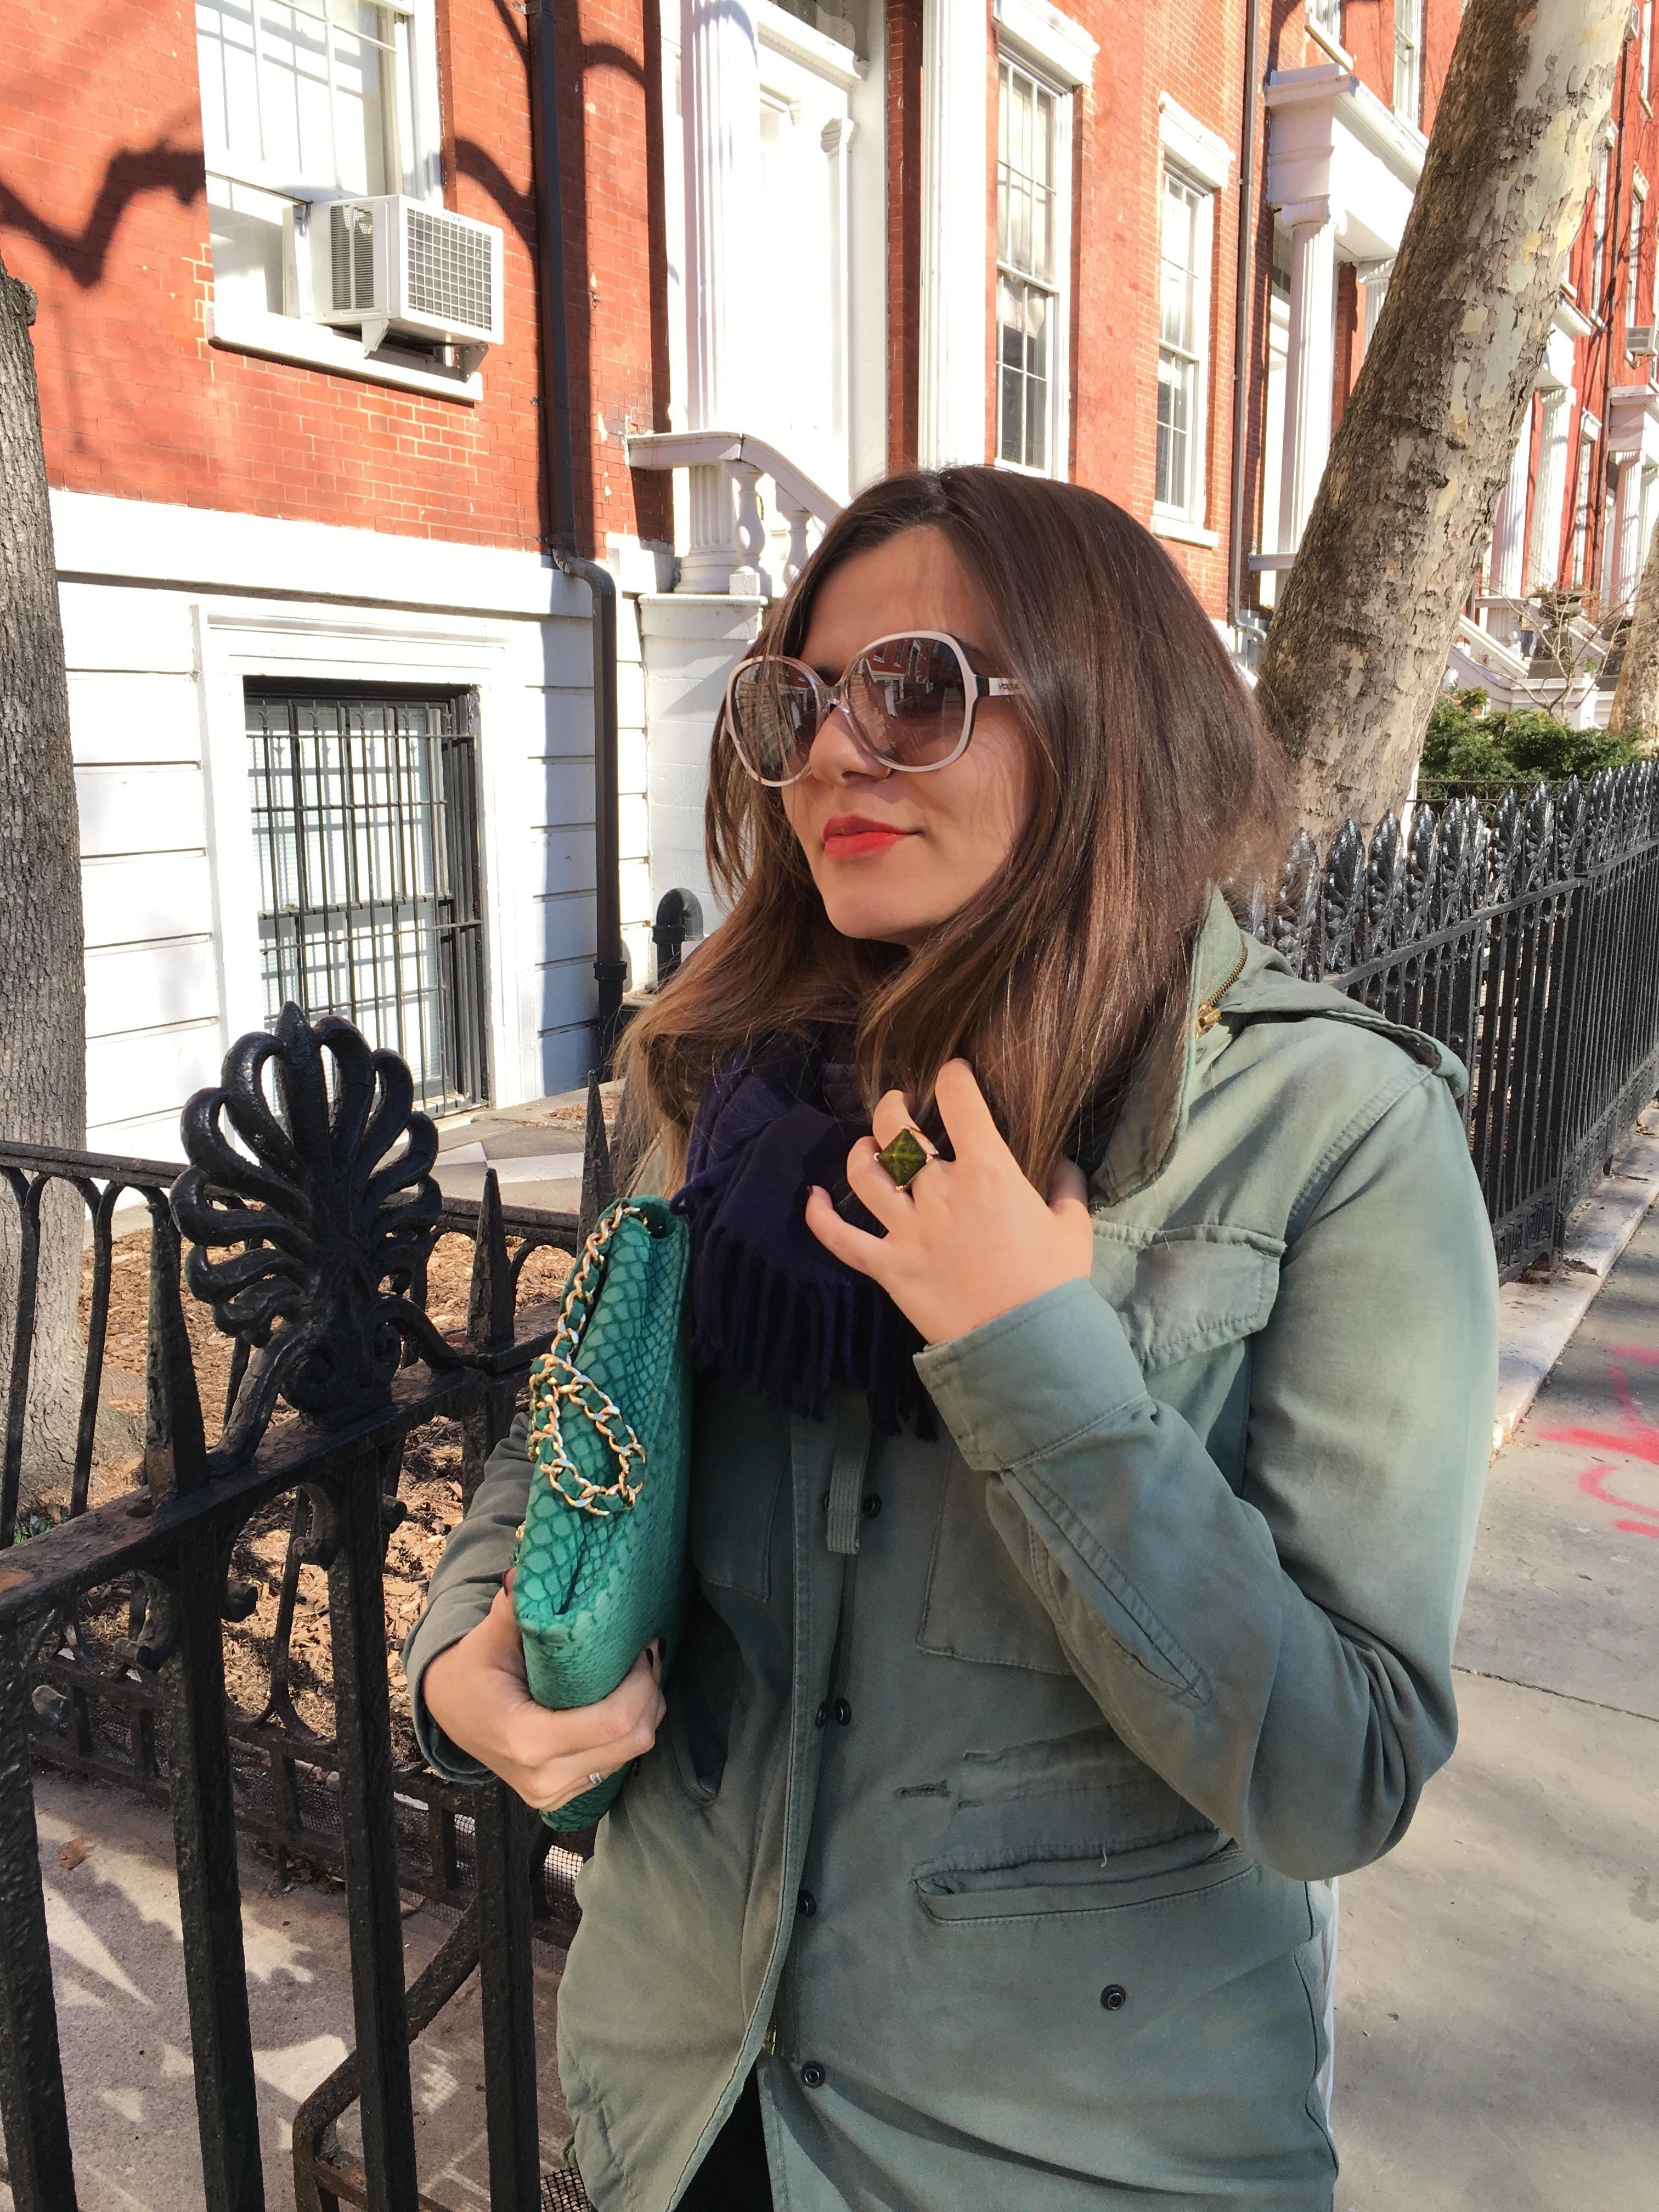 casul_chic_dress_looks_alley_girl_new_york_fashion_blog9